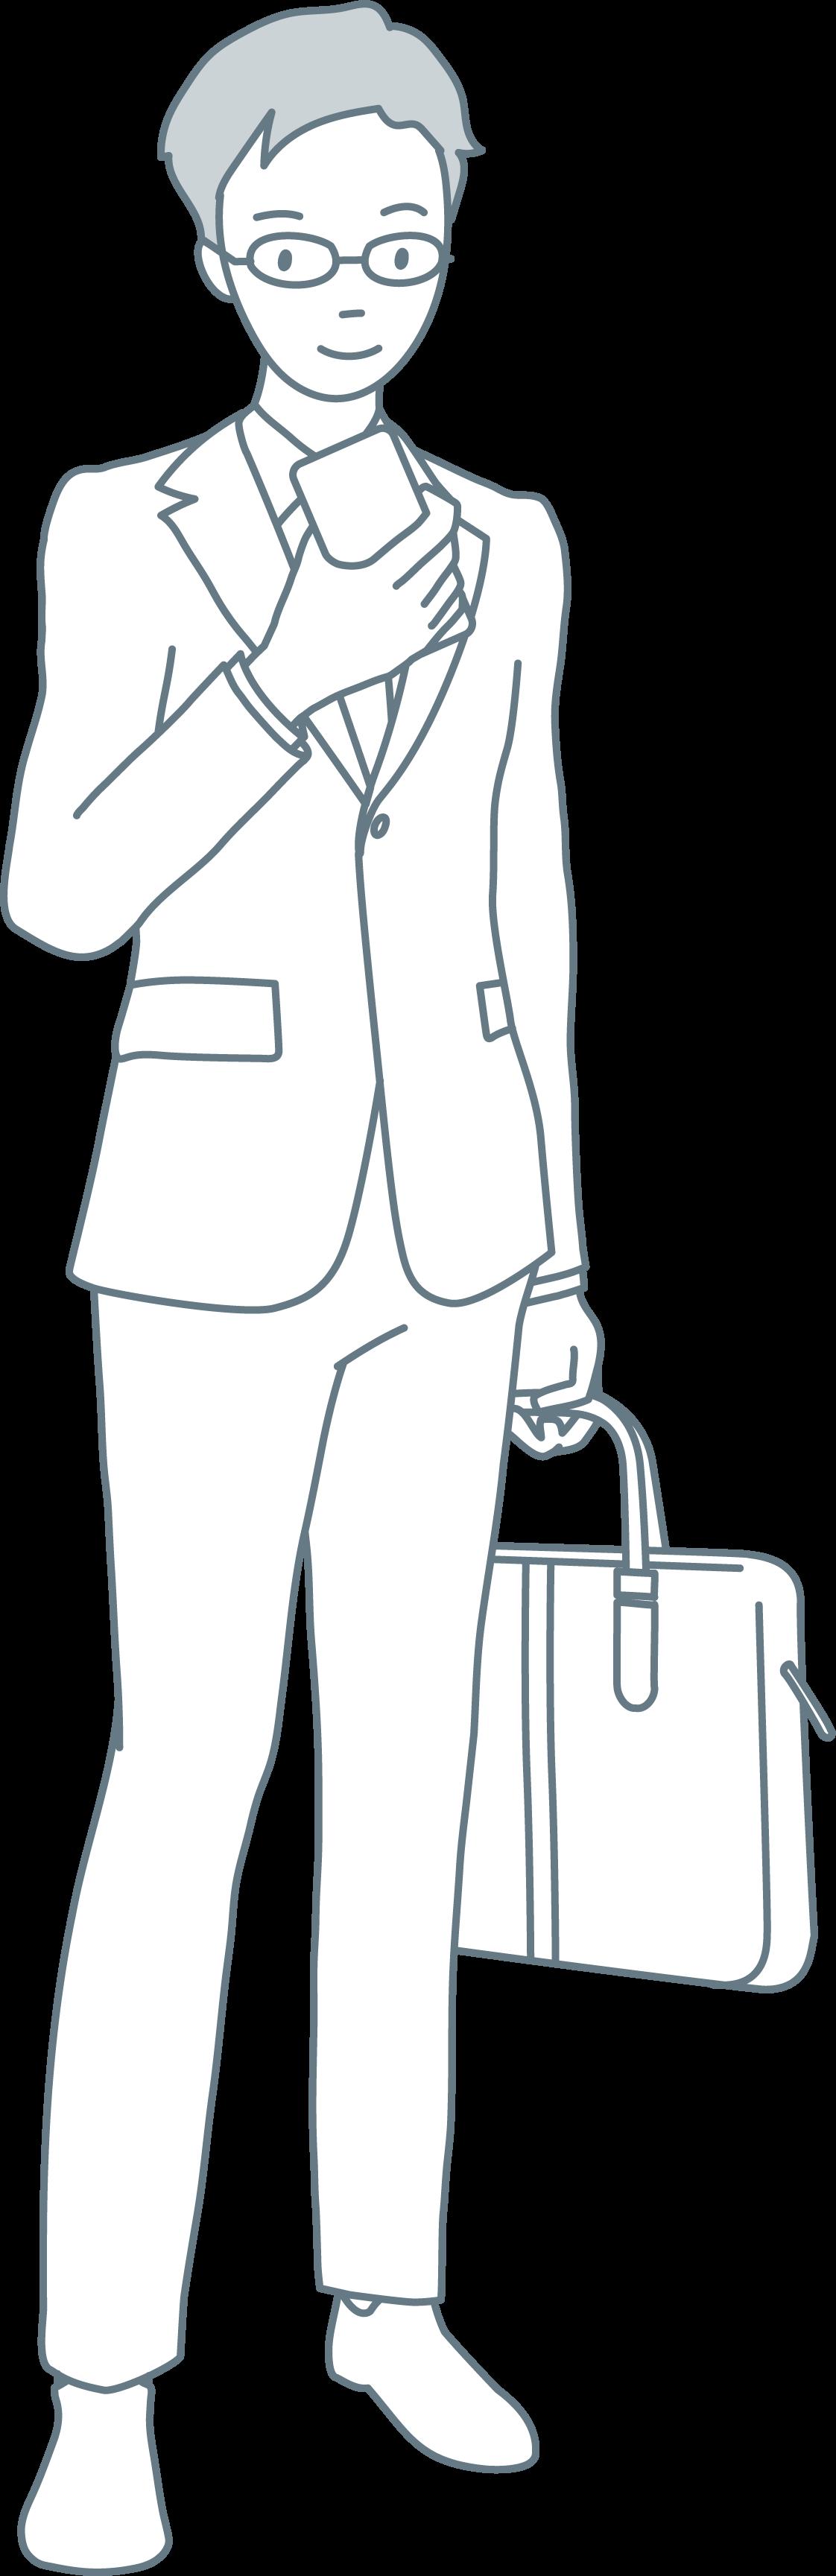 contrfinder-illustration__people-smartphone